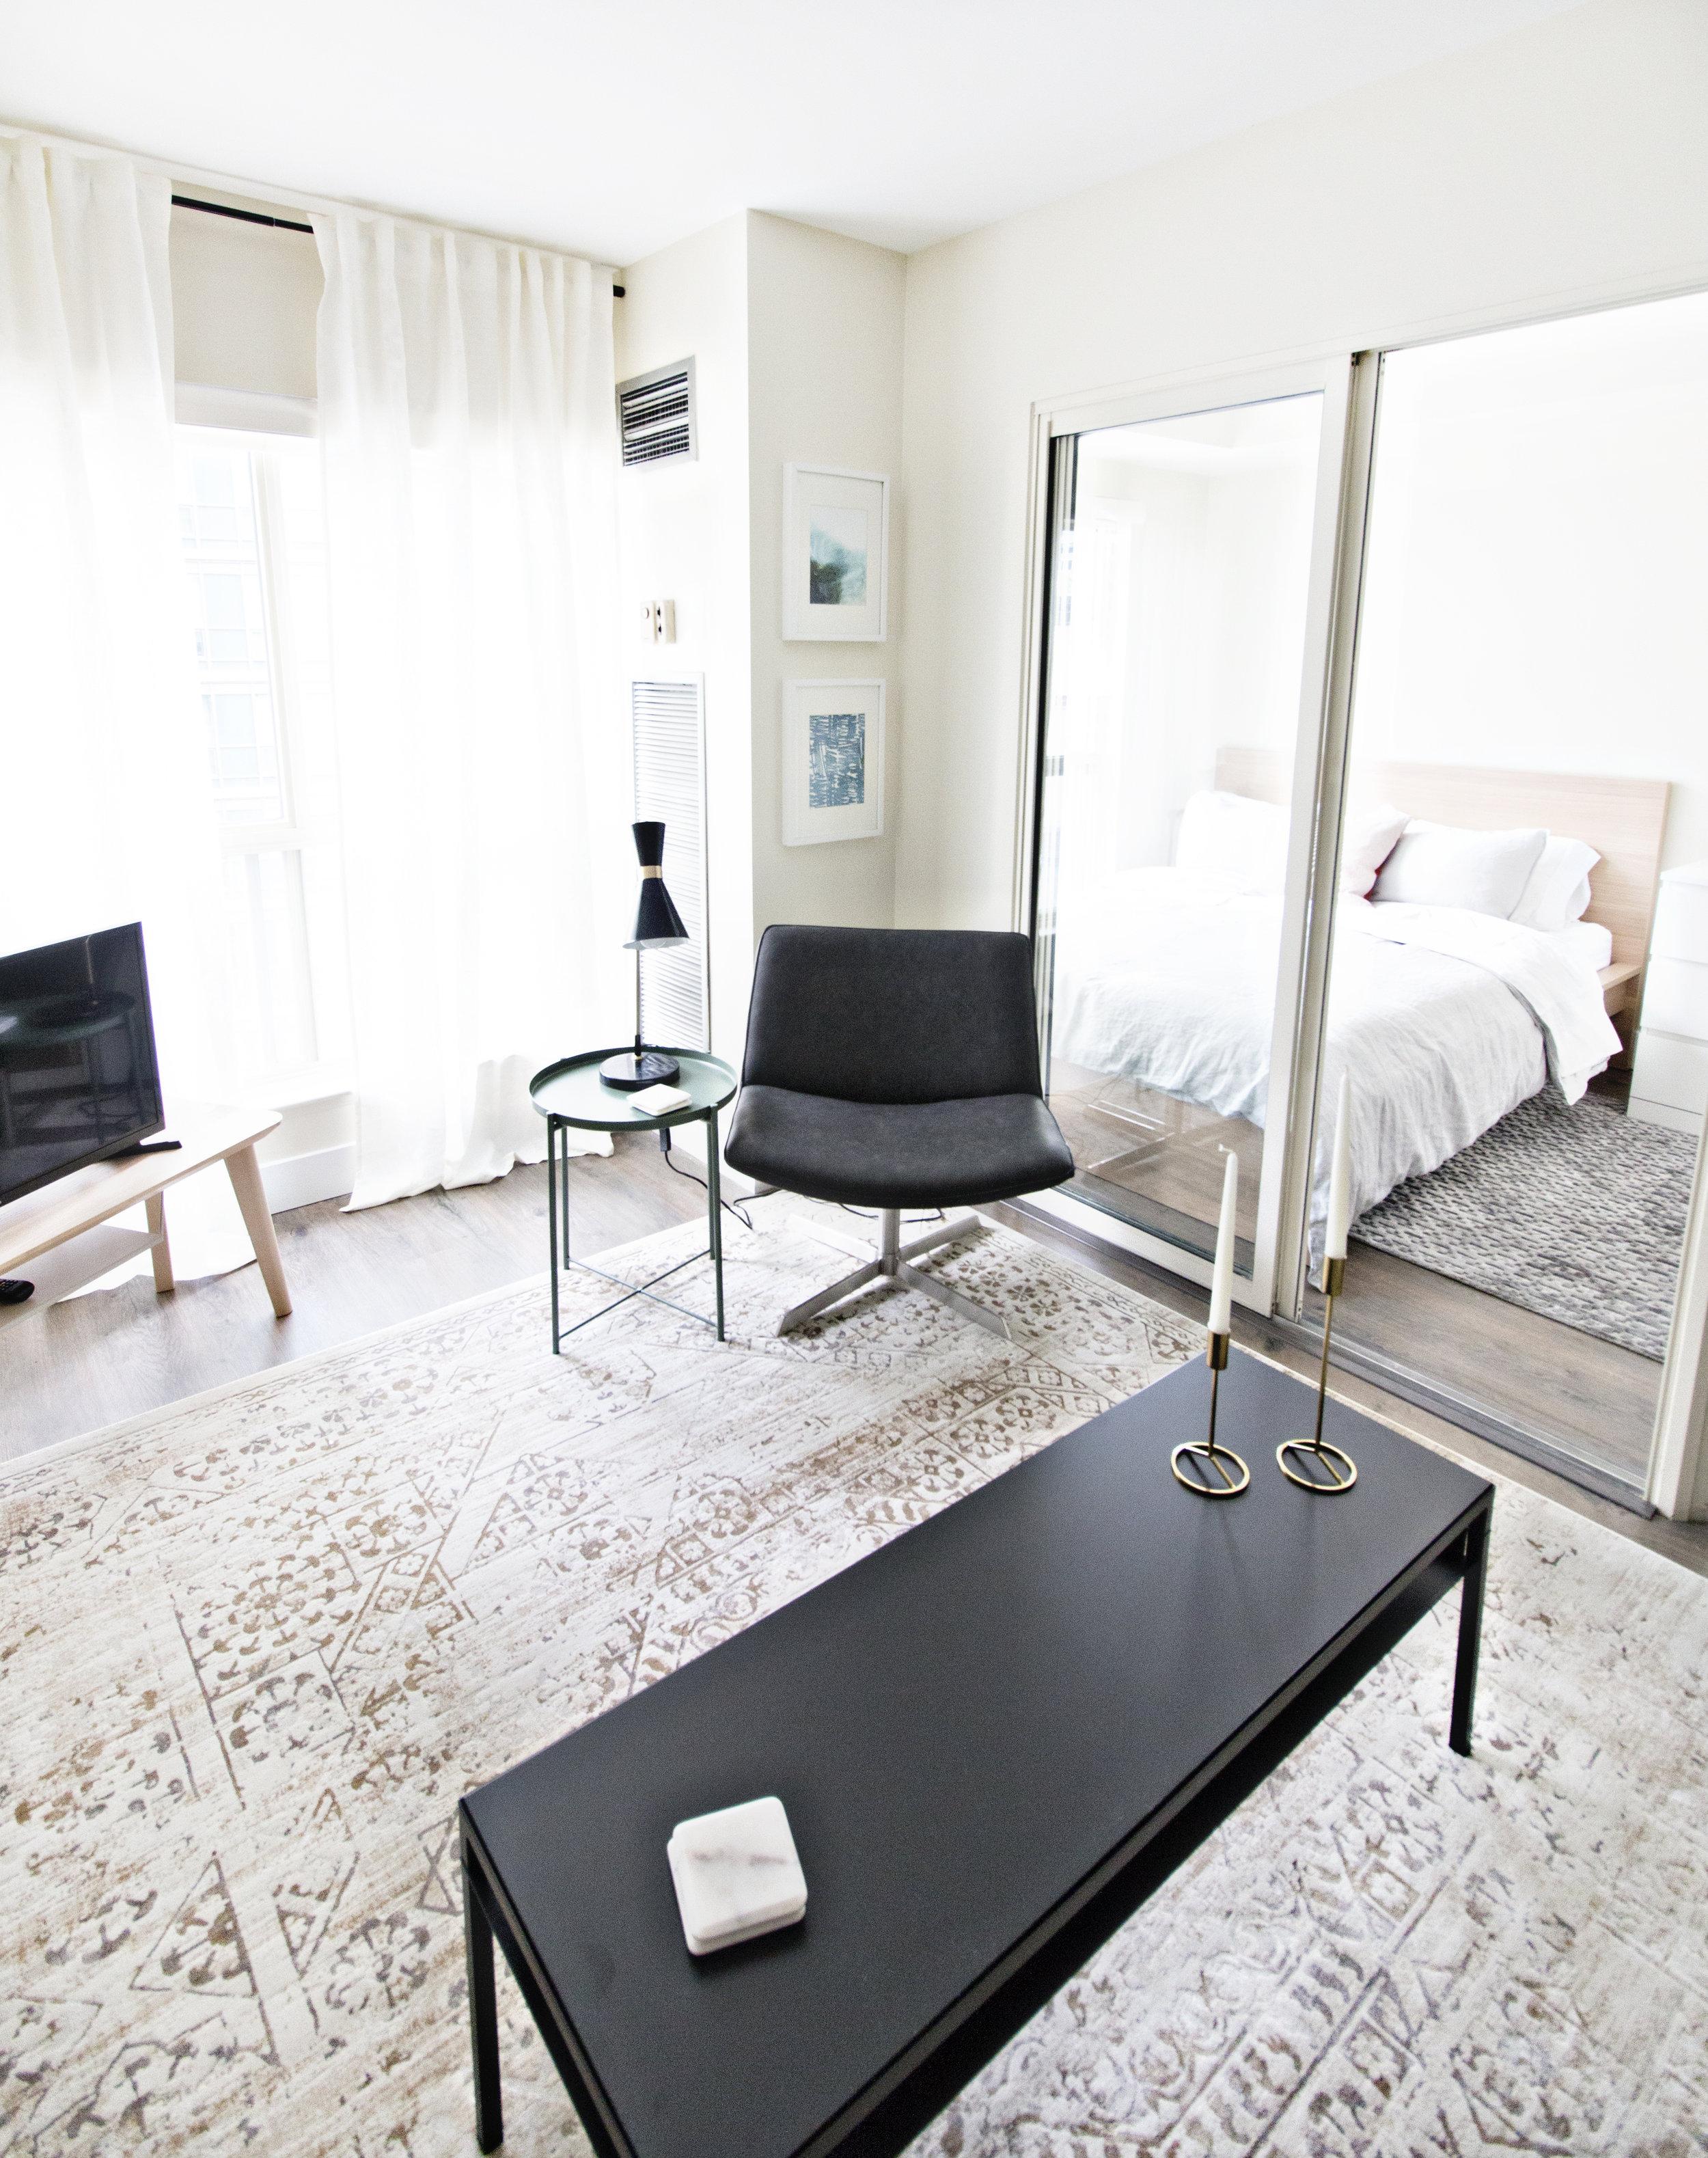 Living room bed room.jpg